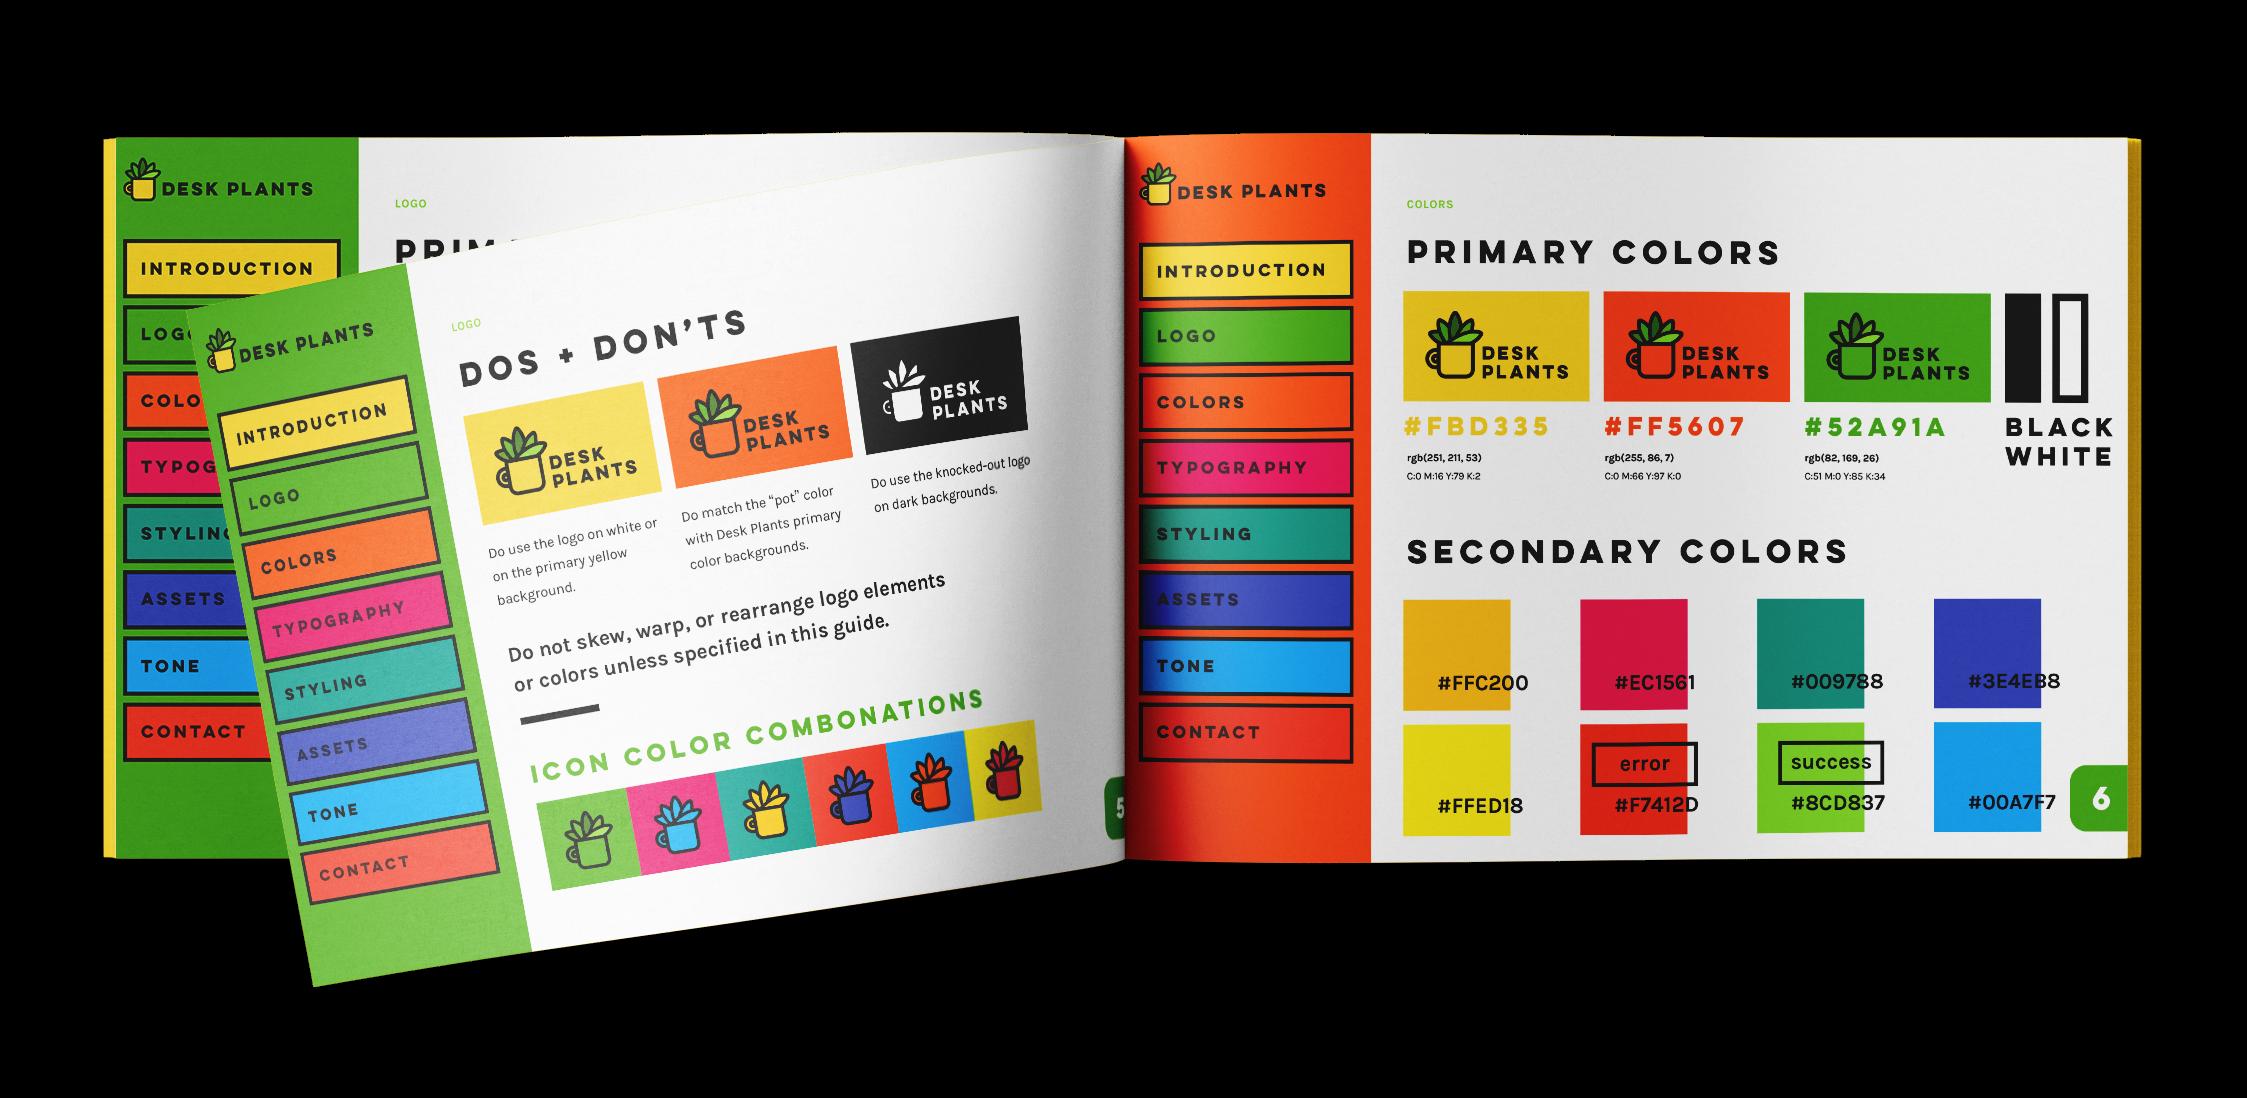 A full brand guideline book